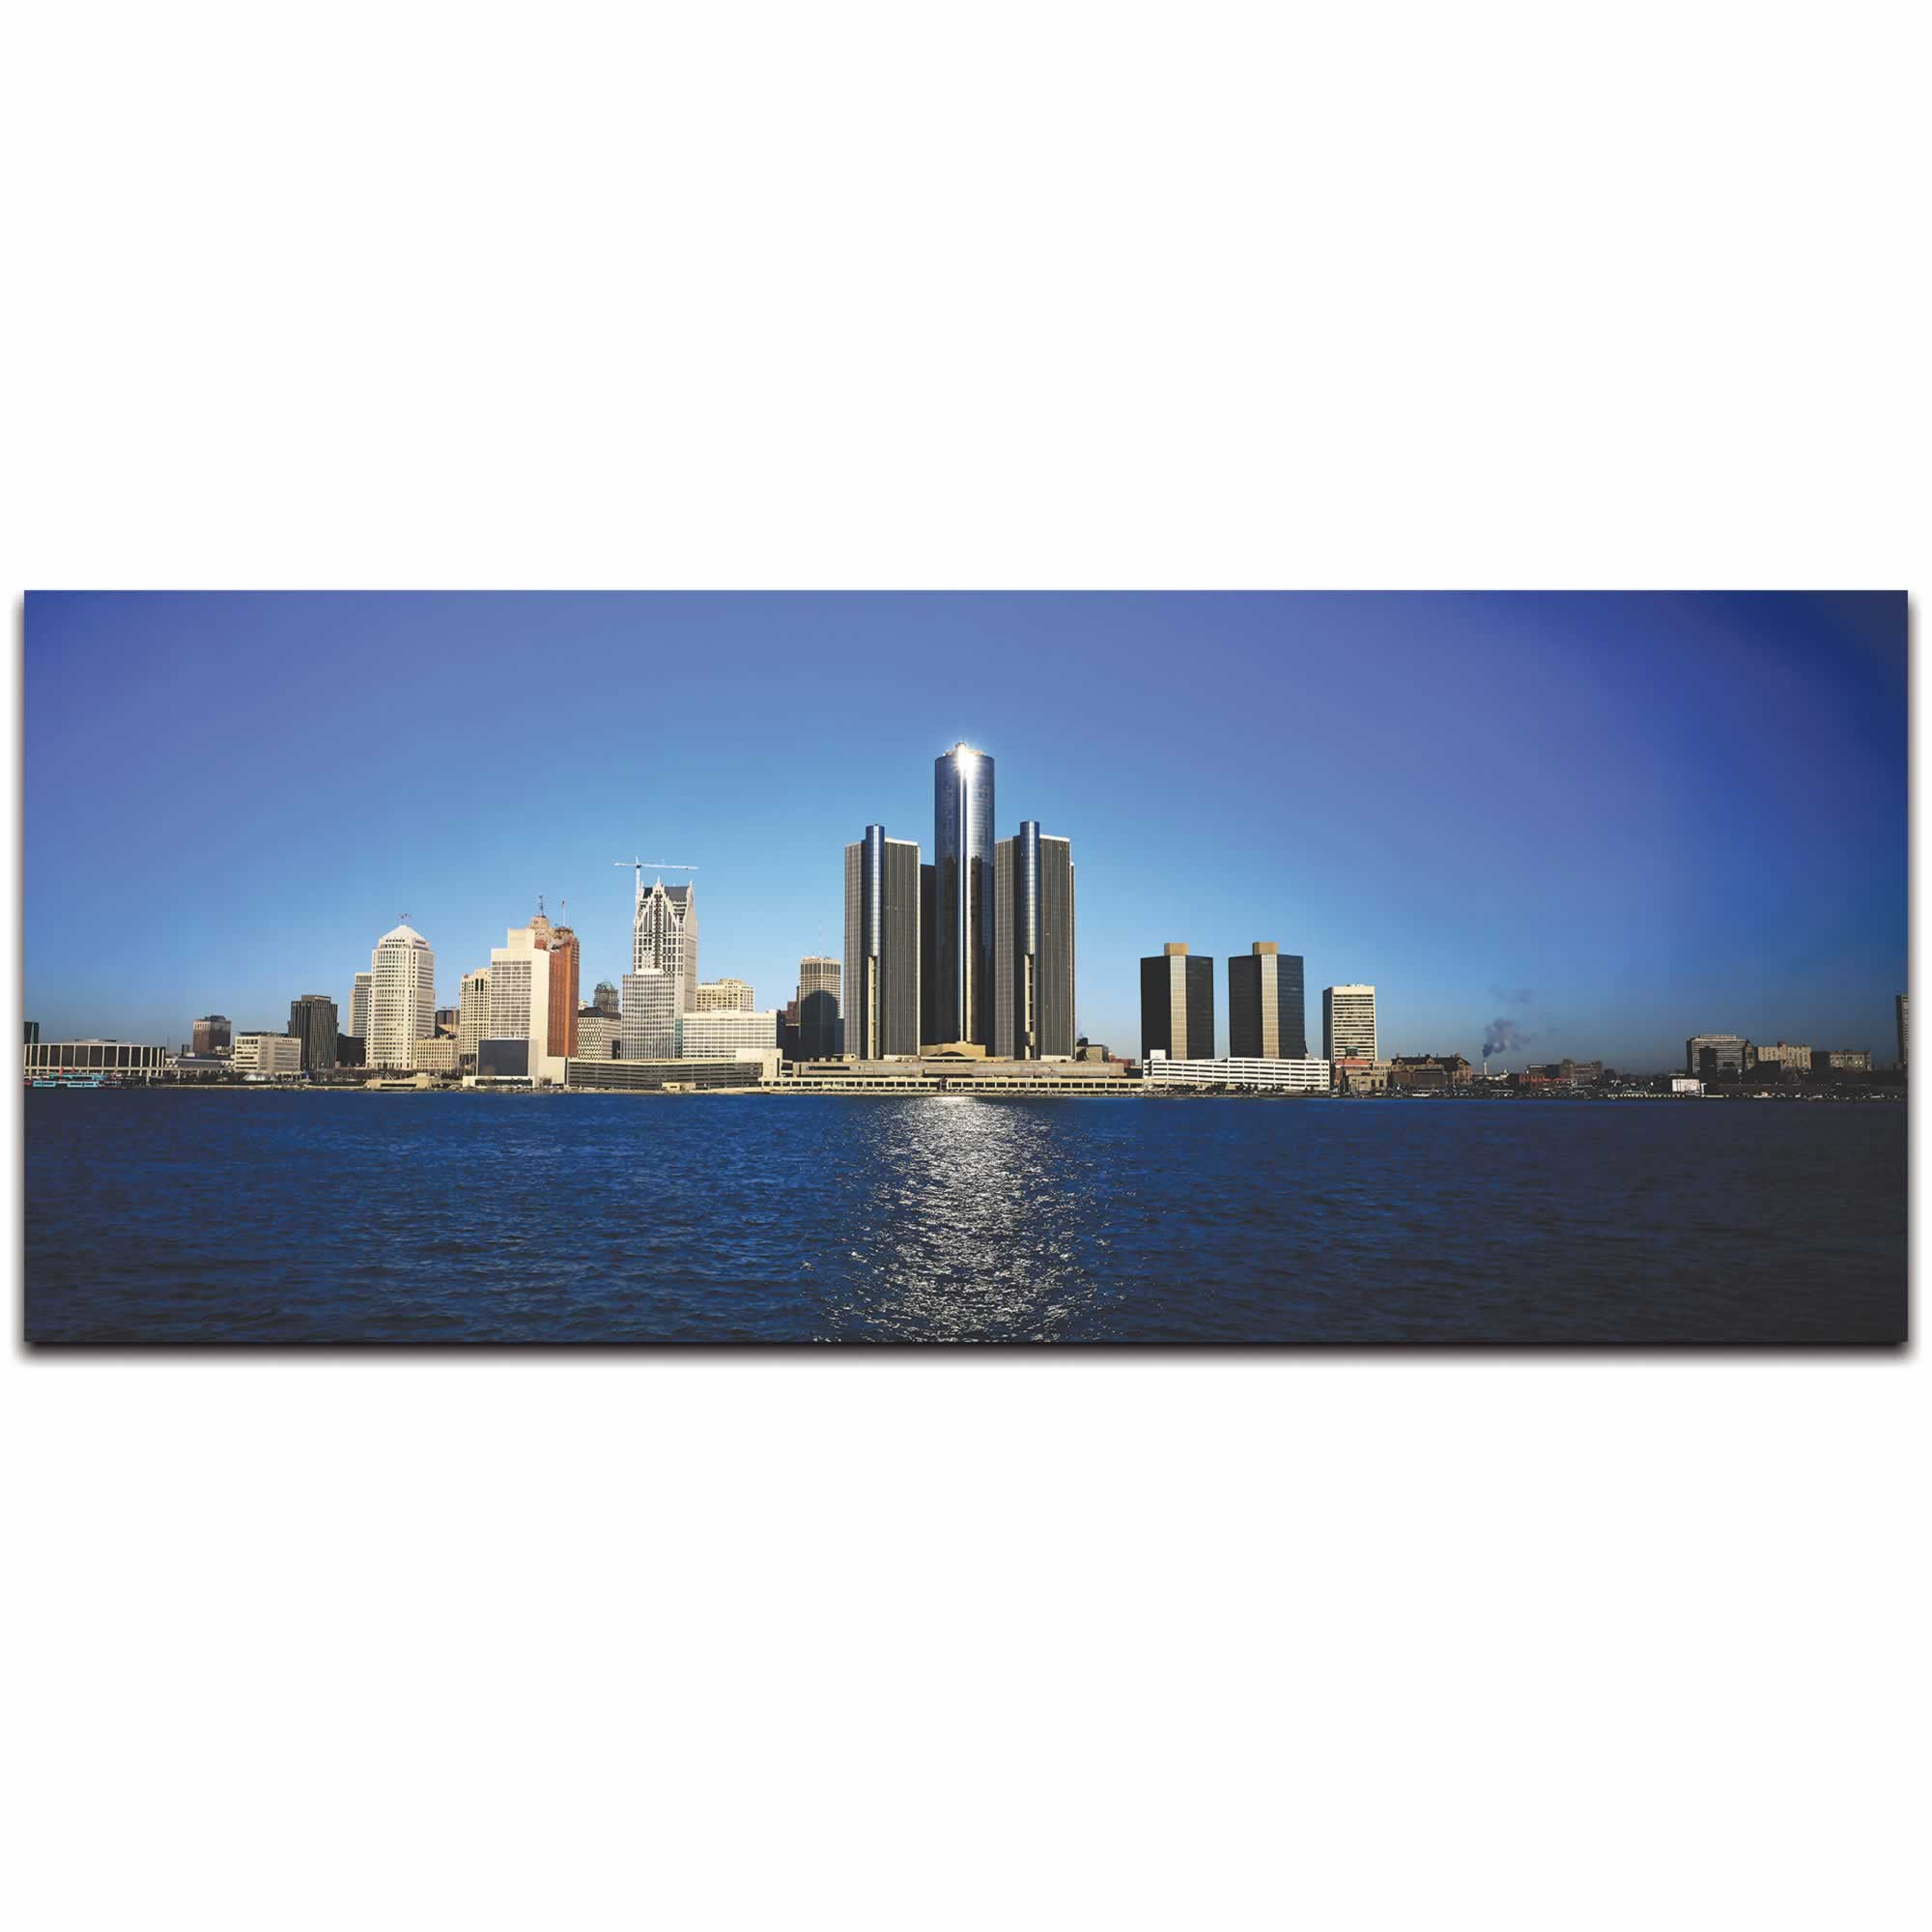 Detroit City Skyline - Urban Modern Art, Designer Home Decor, Cityscape Wall Artwork, Trendy Contemporary Art - Alternate View 2